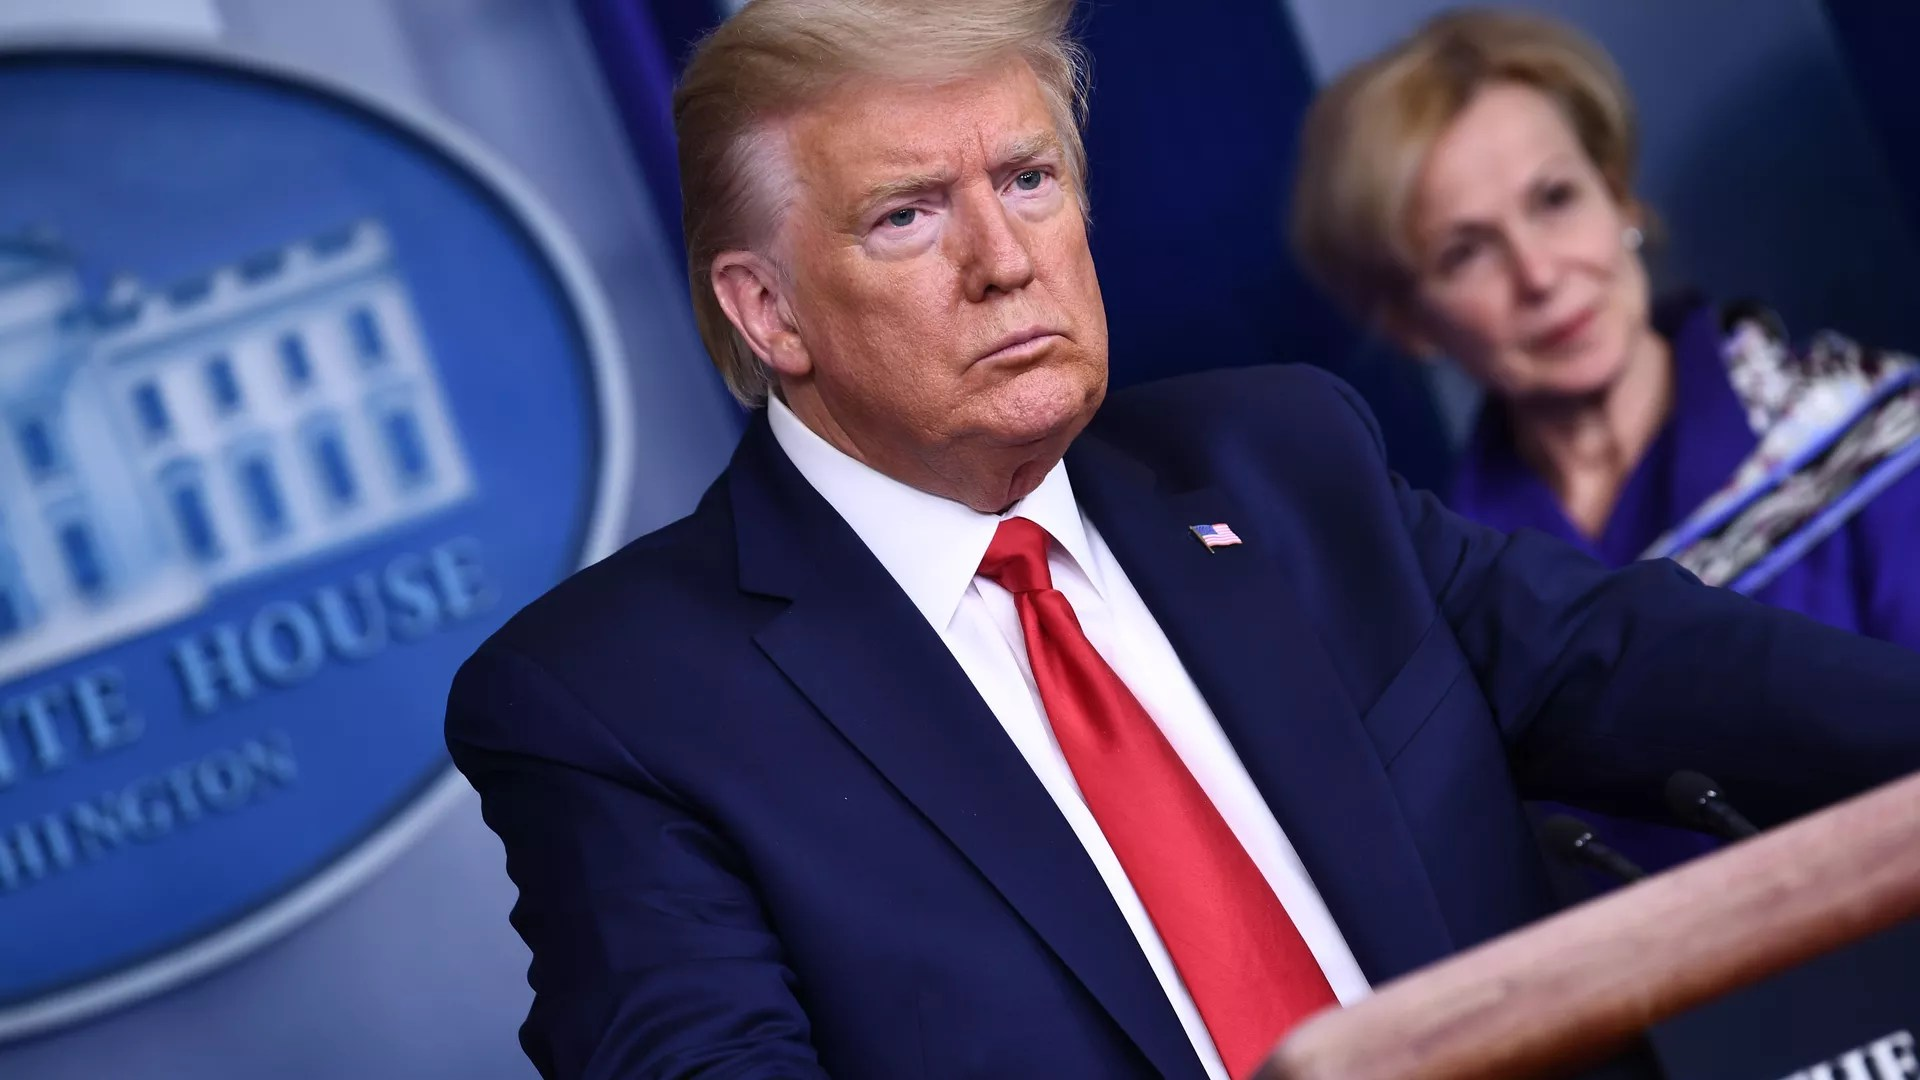 White House proposes $1 trillion coronavirus stimulus package - Axios